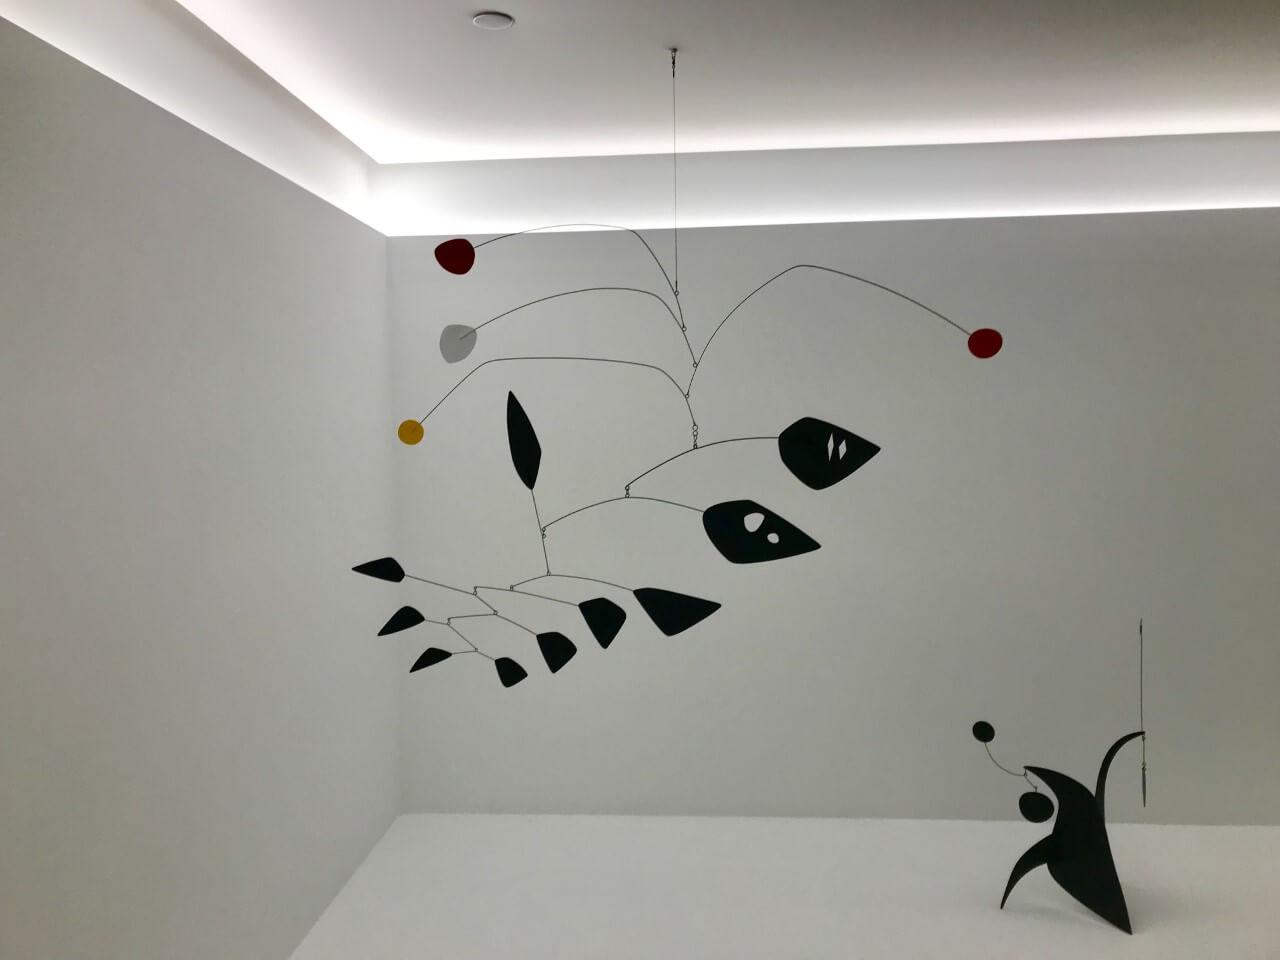 Sculpture by Alexander Calder at Hauswer & Wirth Los Angeles